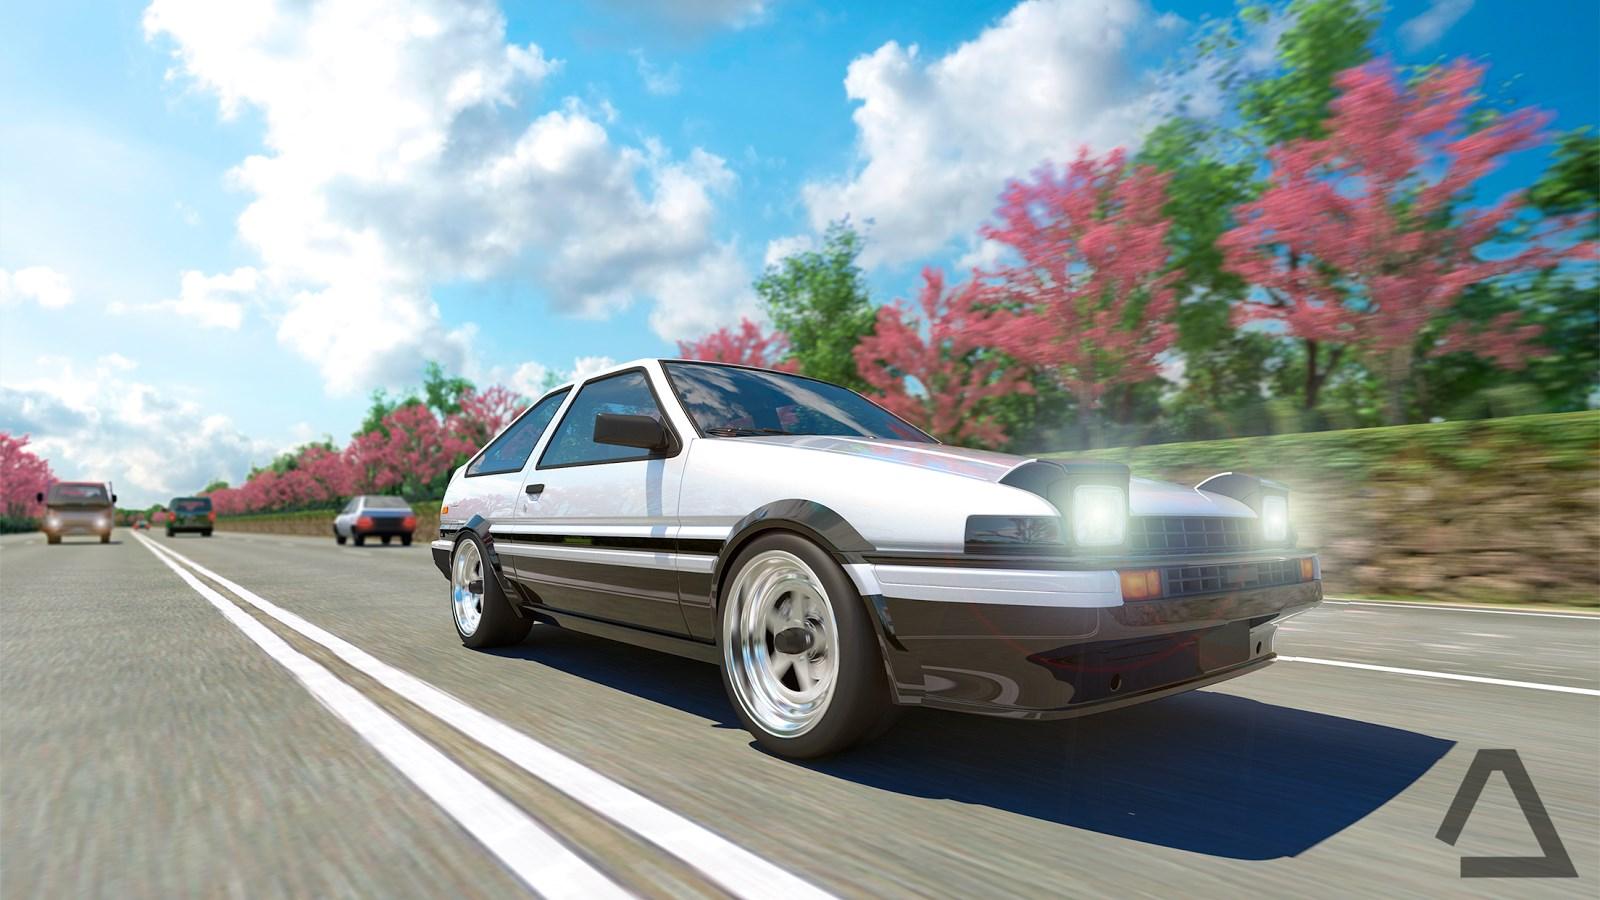 Driving Zone: Japan - Imagem 3 do software